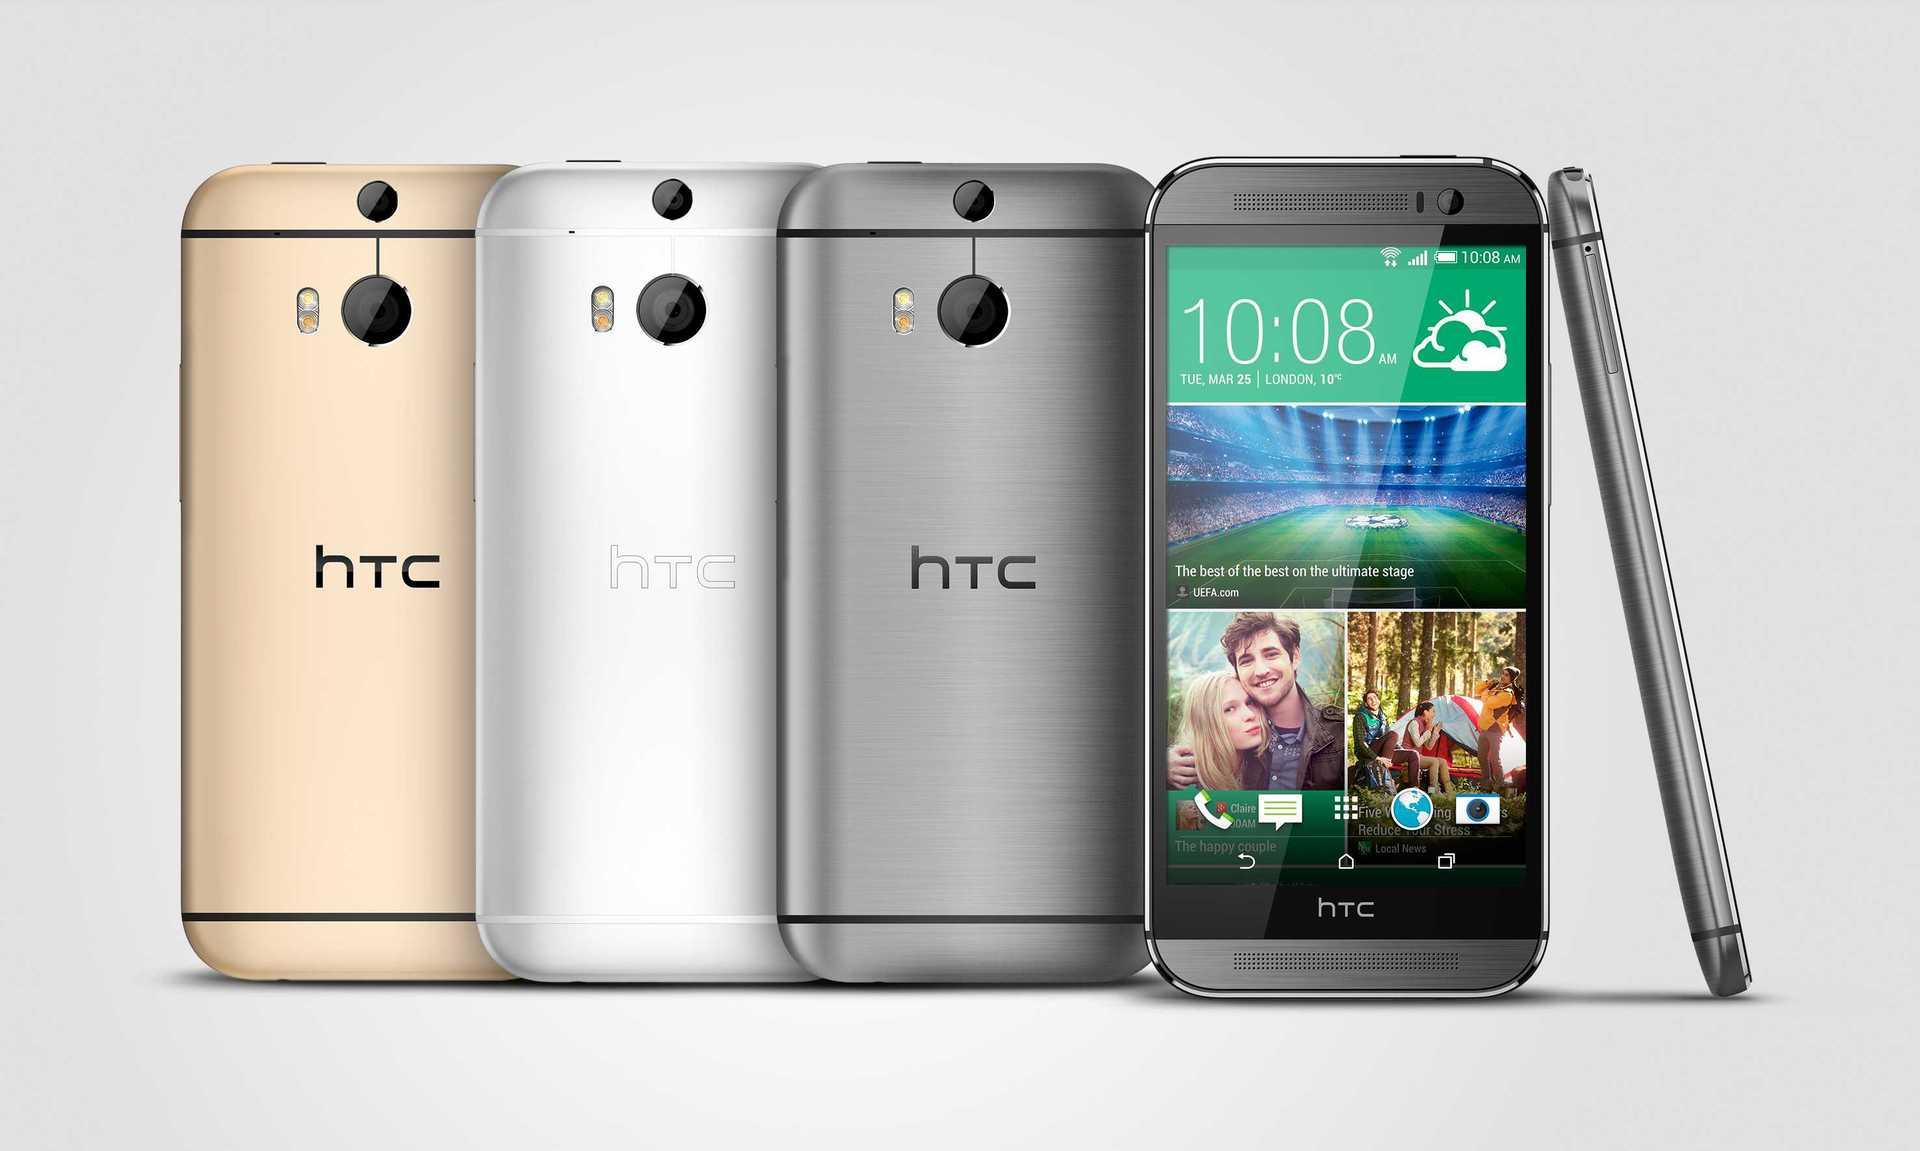 Photo gallery evento HTC milano